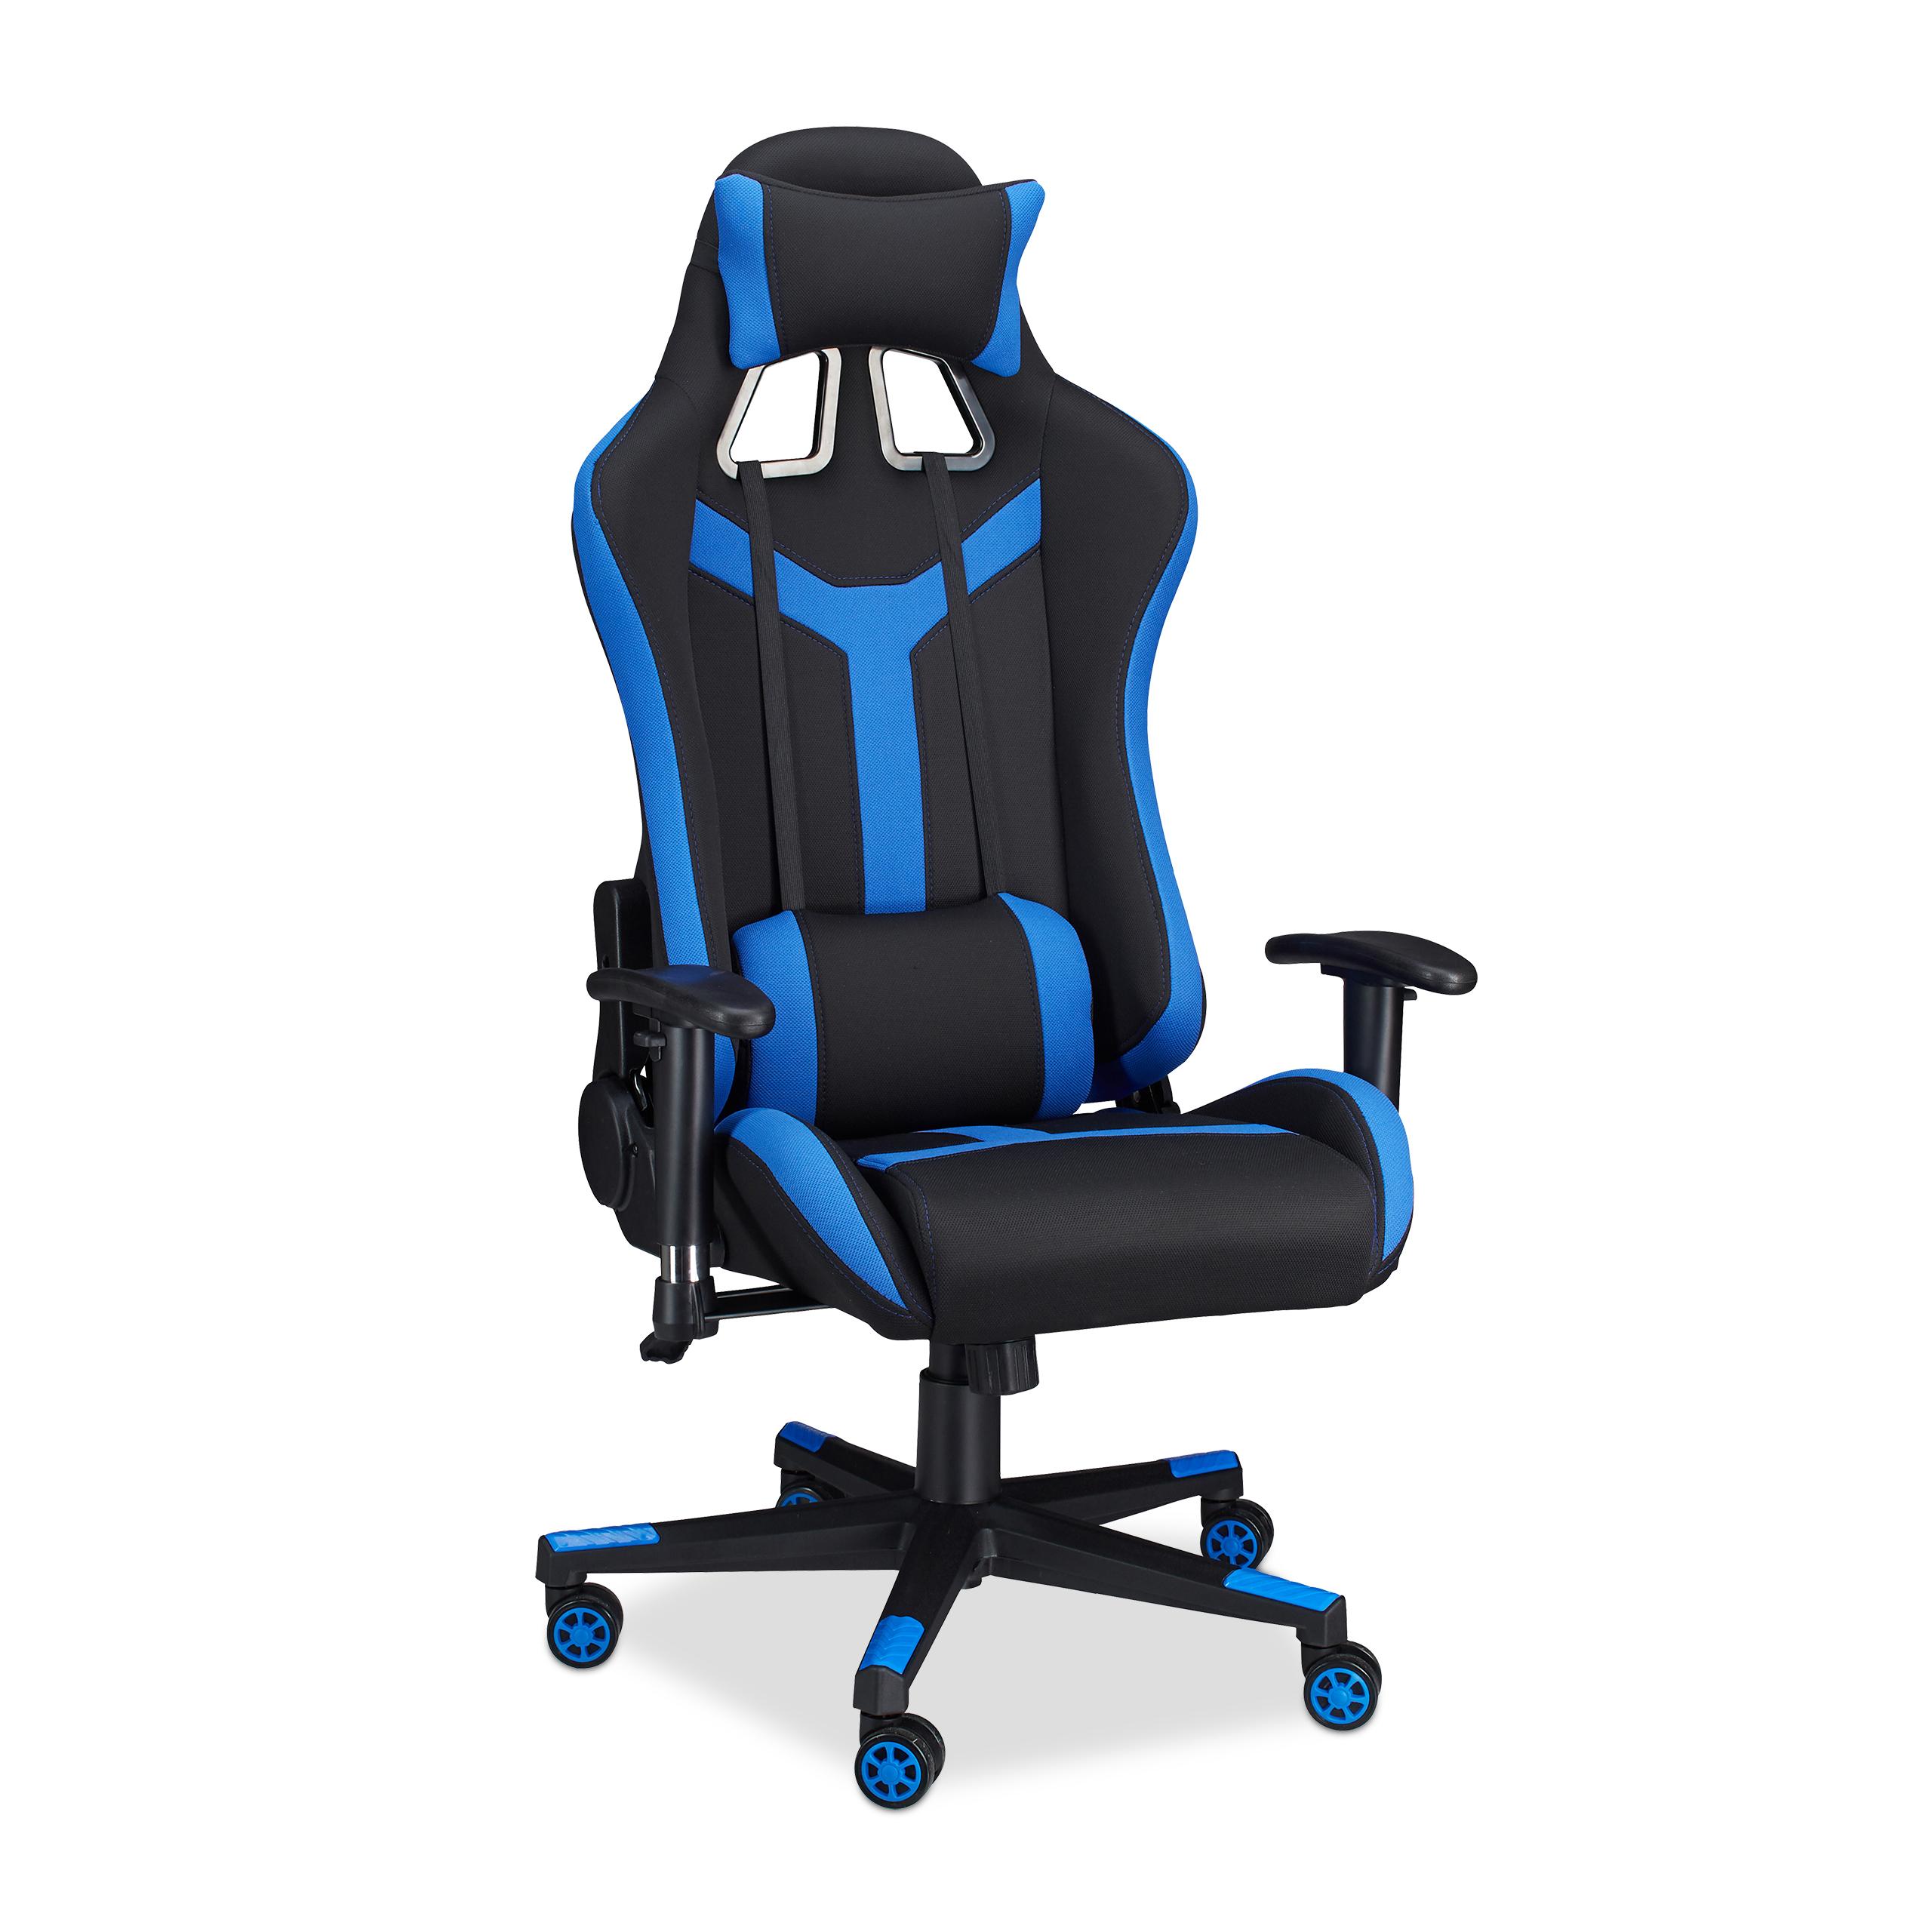 Gaming stuhl xr10 b rostuhl bis 120kg gamer chair verstellbar computerstuhl ebay - Gaming stuhl ebay ...